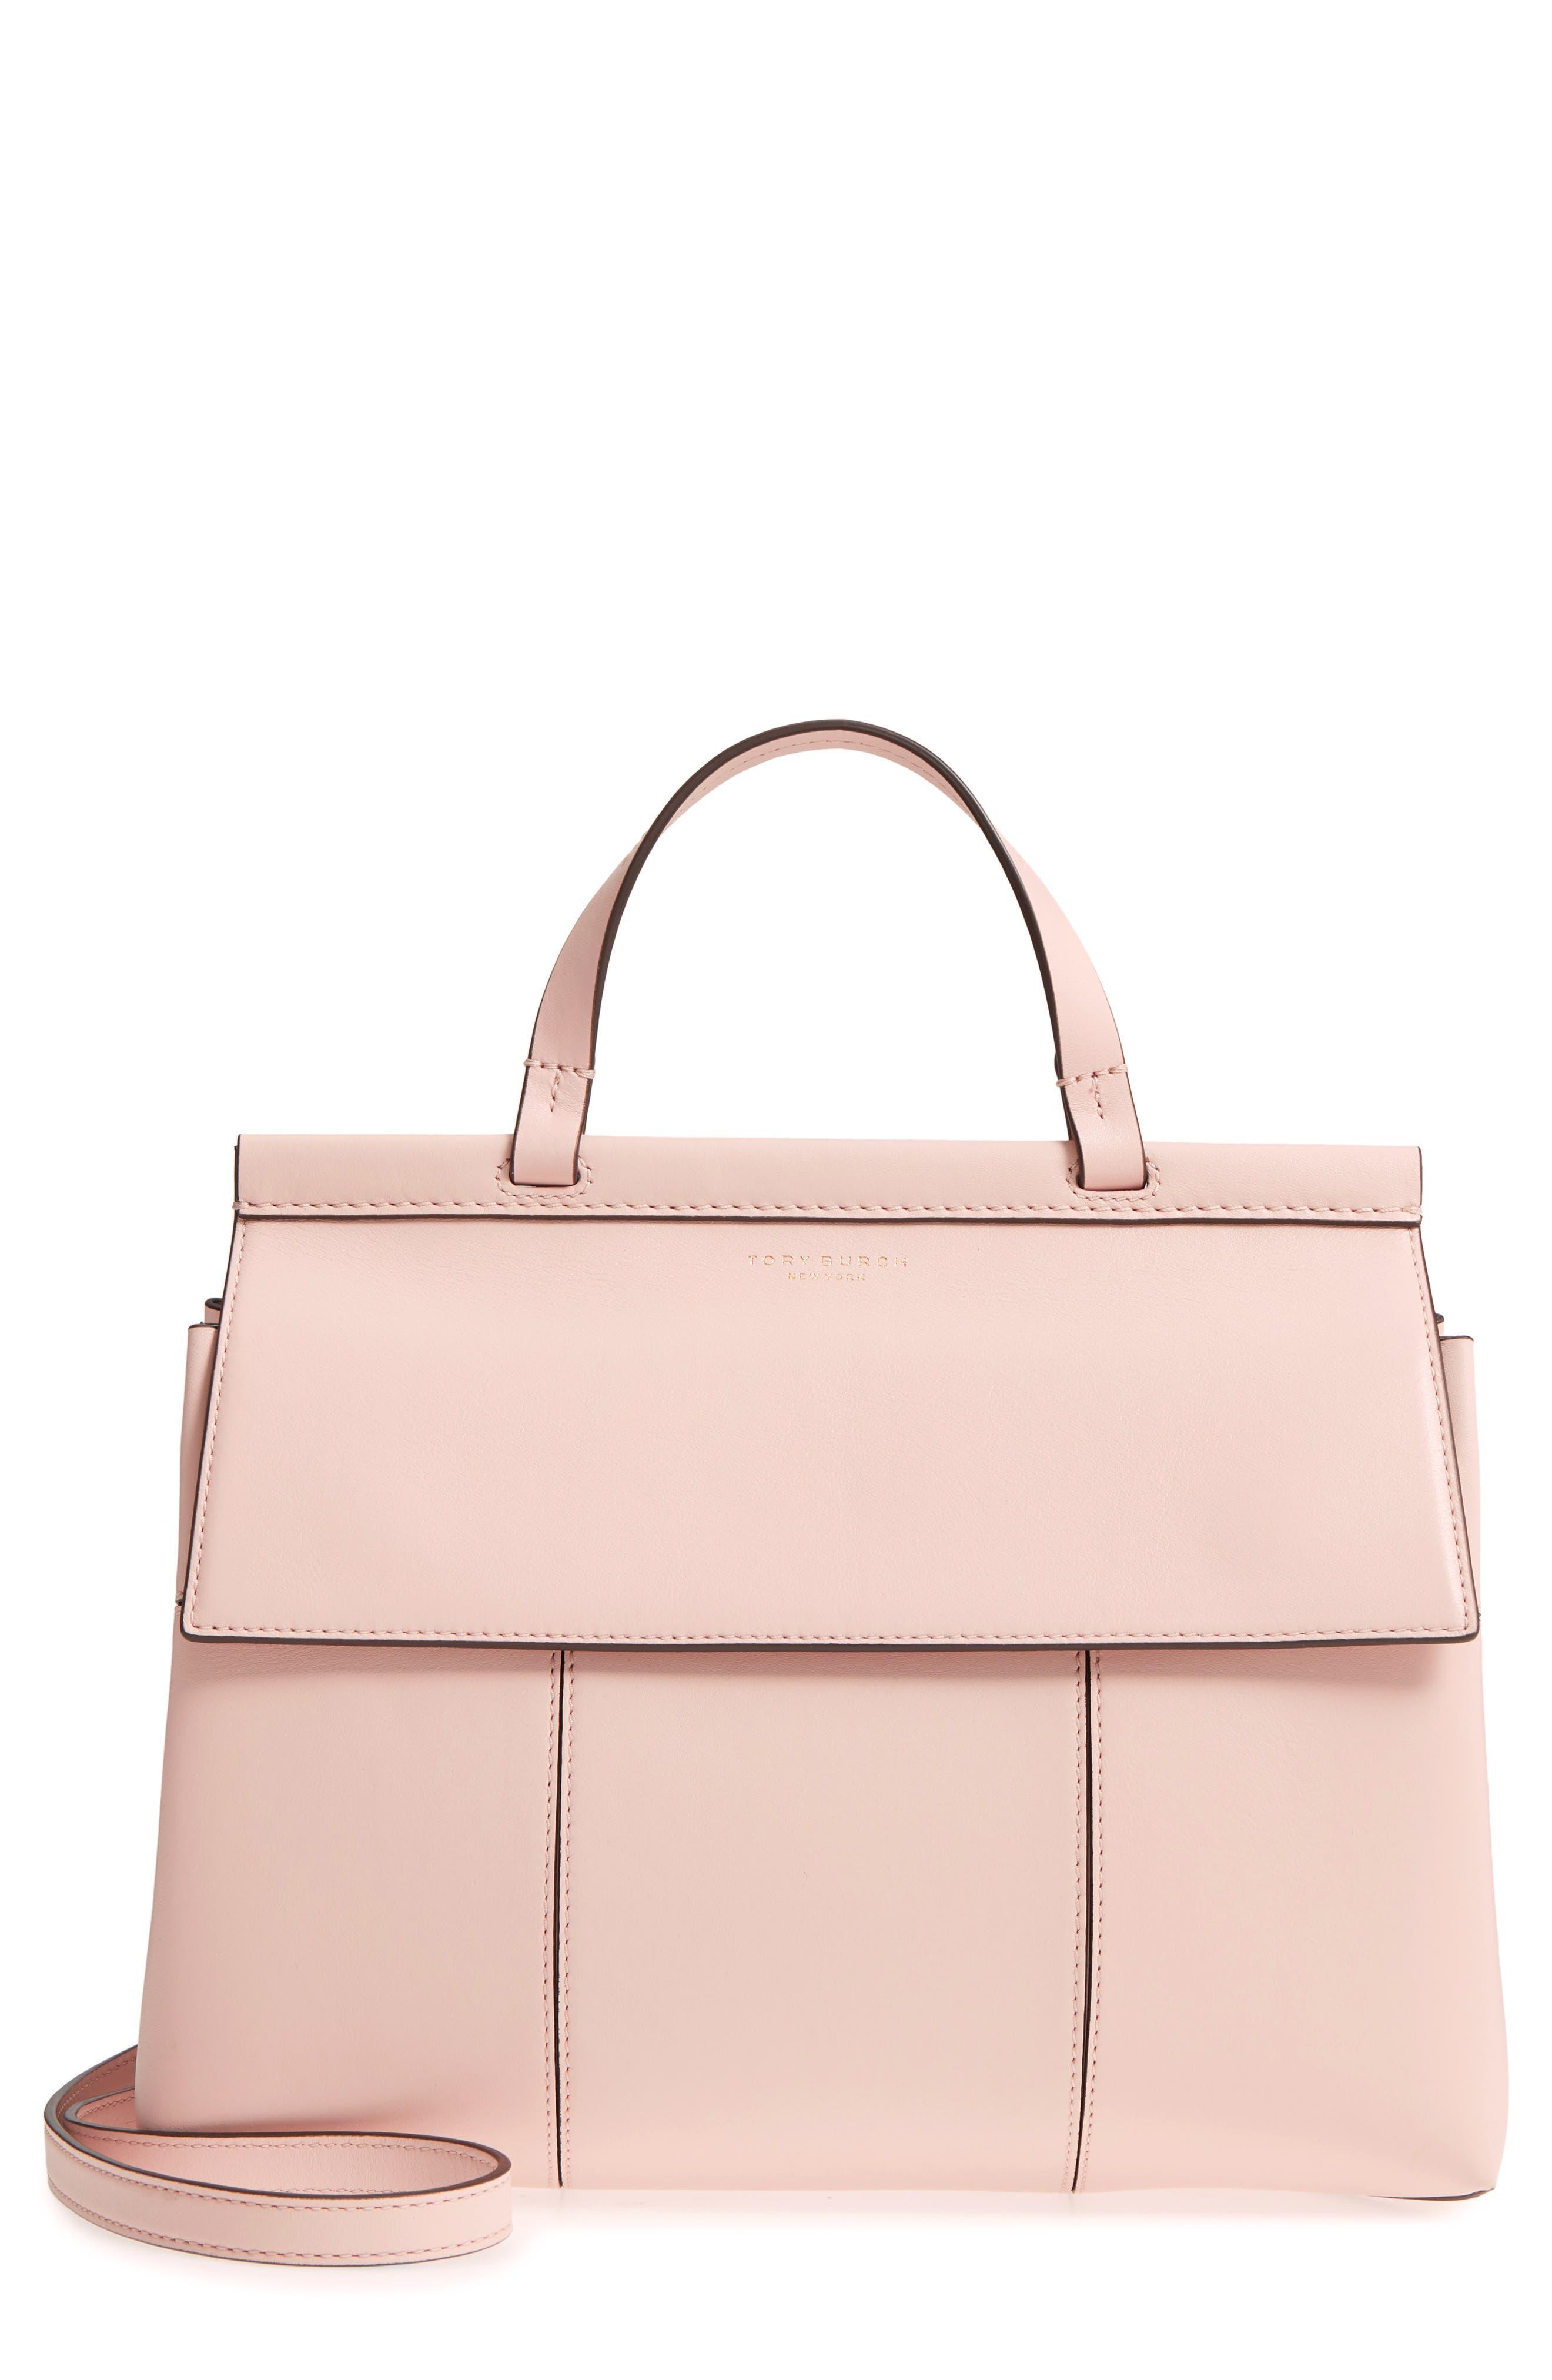 Block T Leather Top Handle Satchel,                         Main,                         color, Shell Pink/ Goan Sand